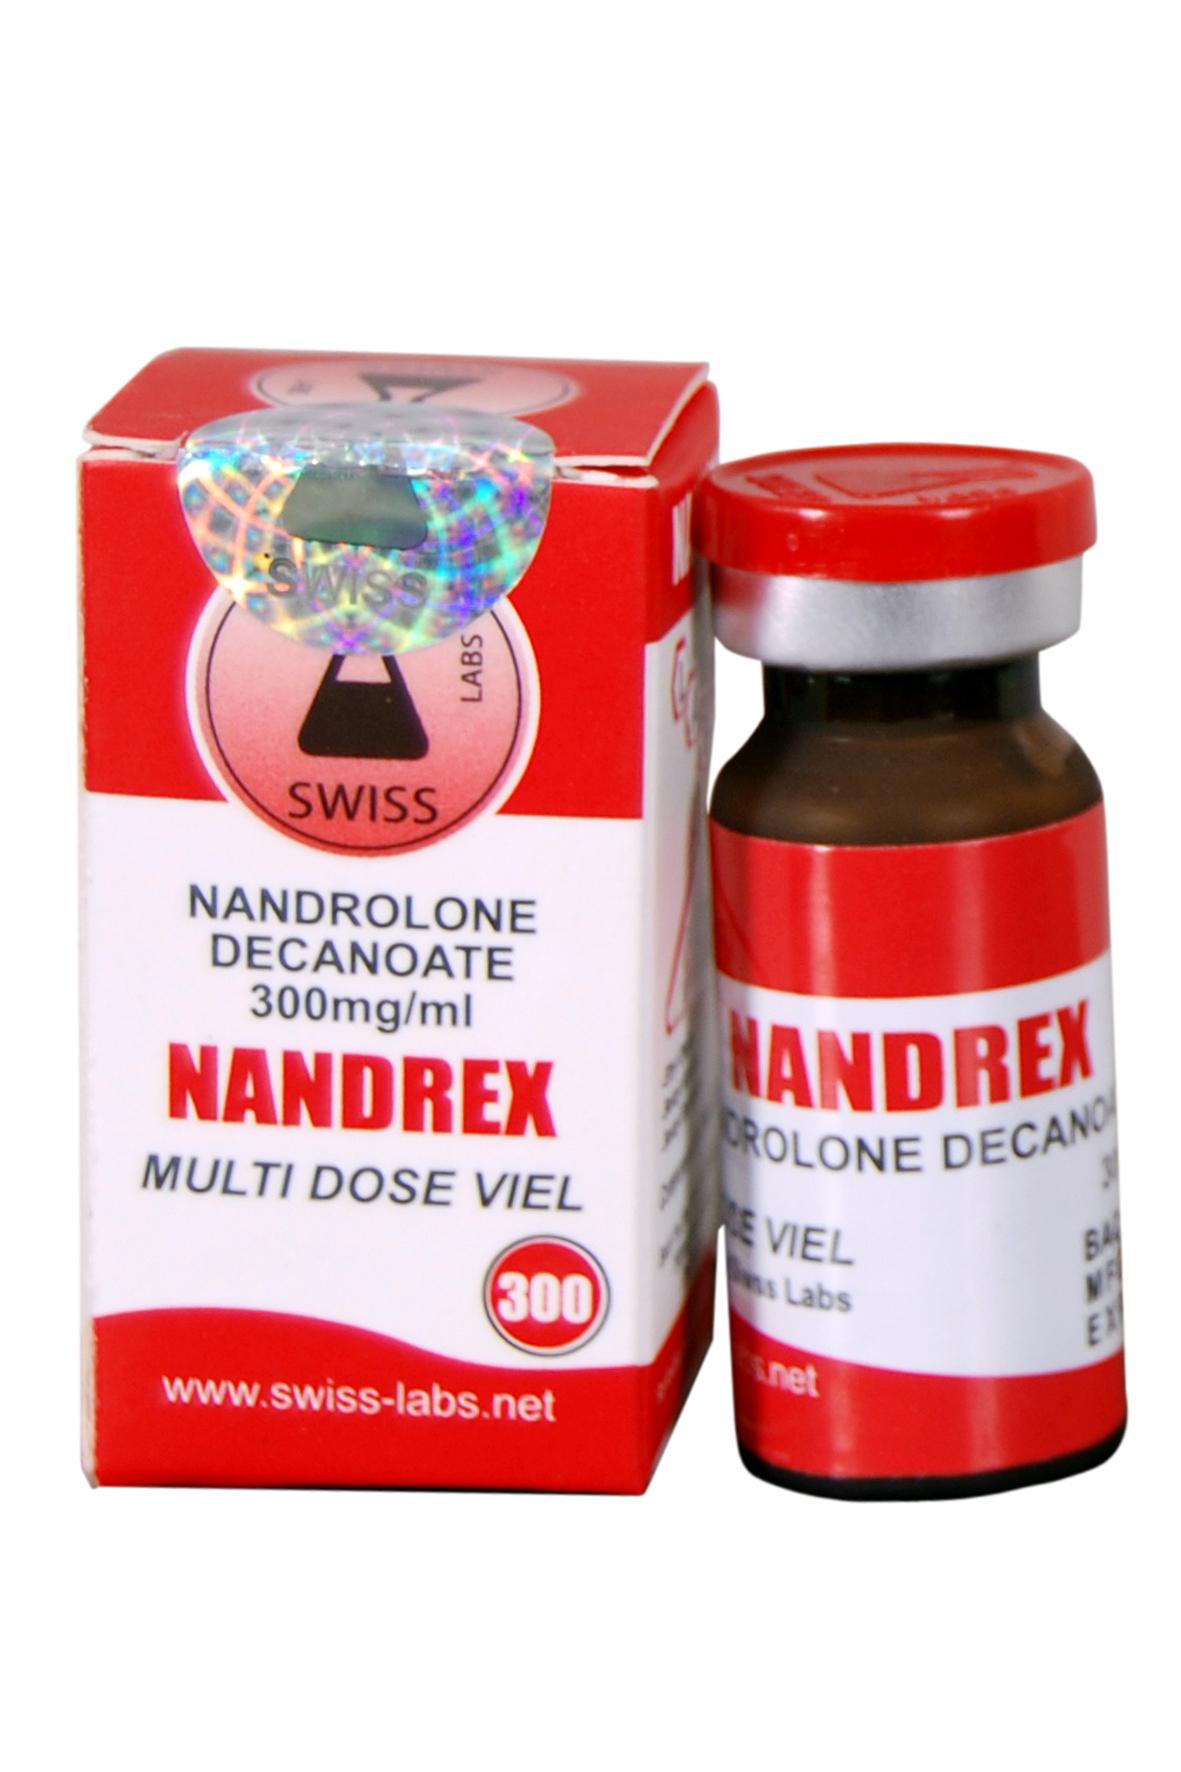 nandrex 300